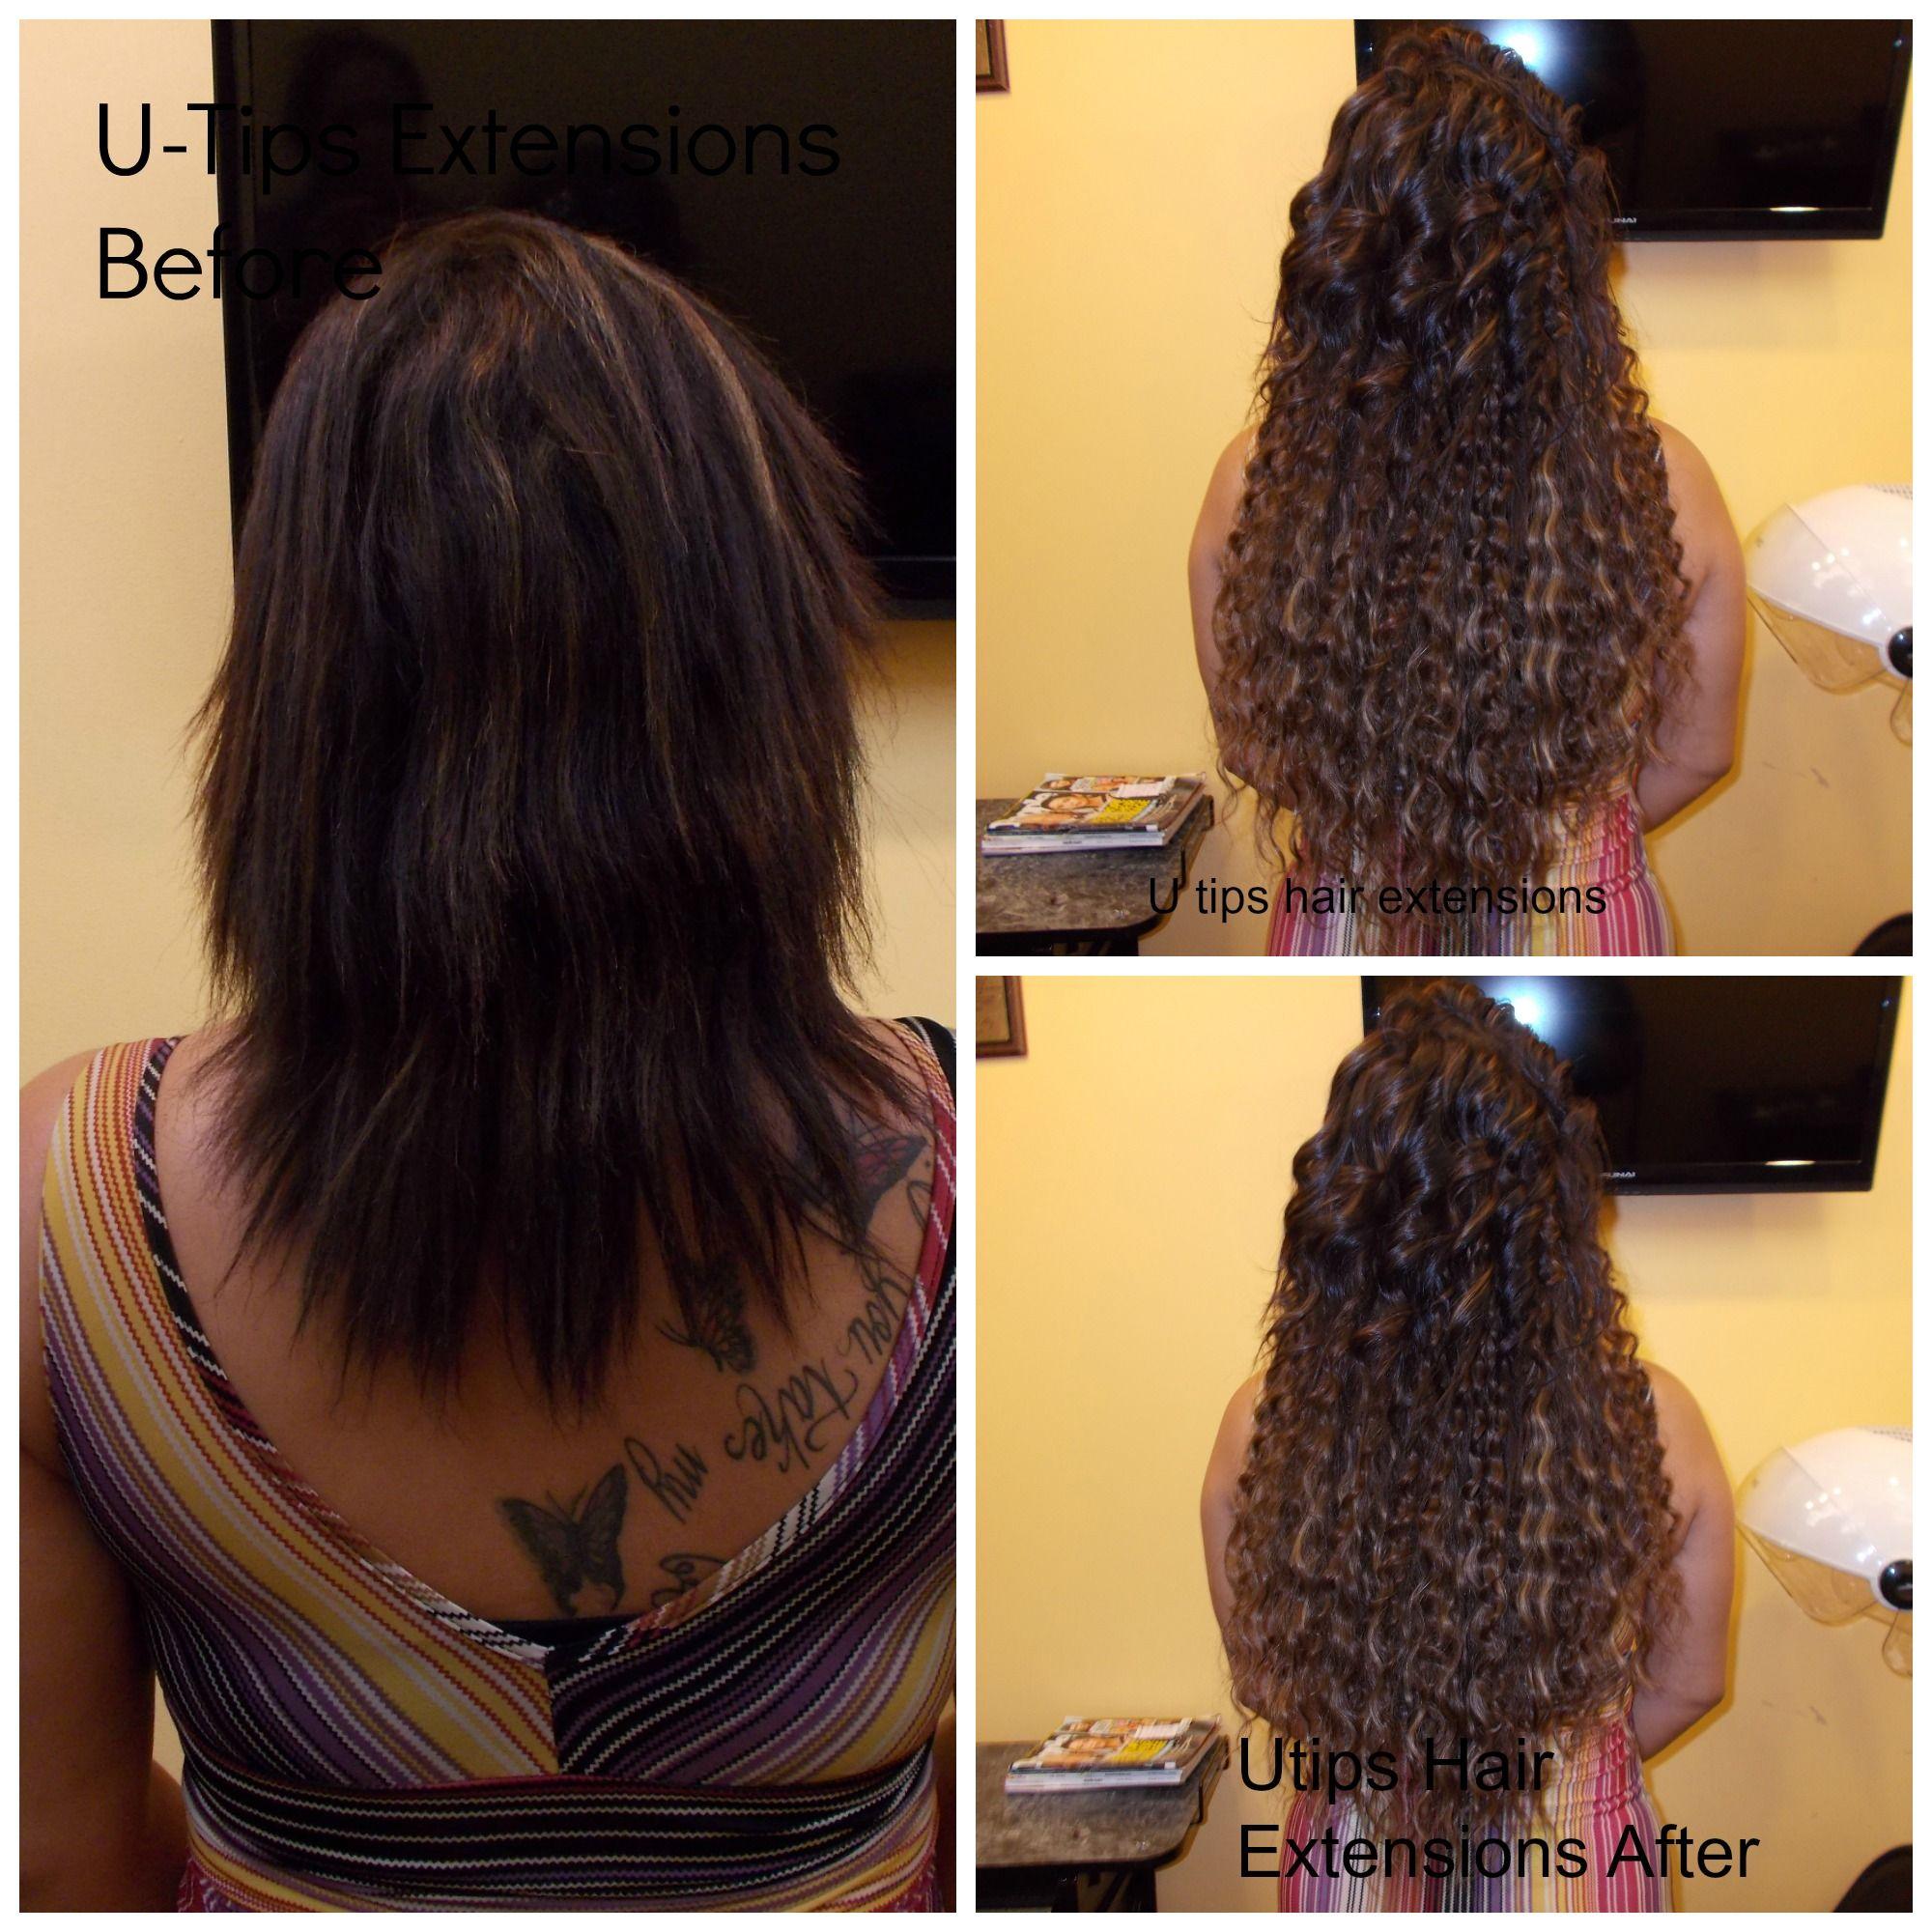 Utips Hair Extensionsll 407 507 3000 Or Visit Httpwww